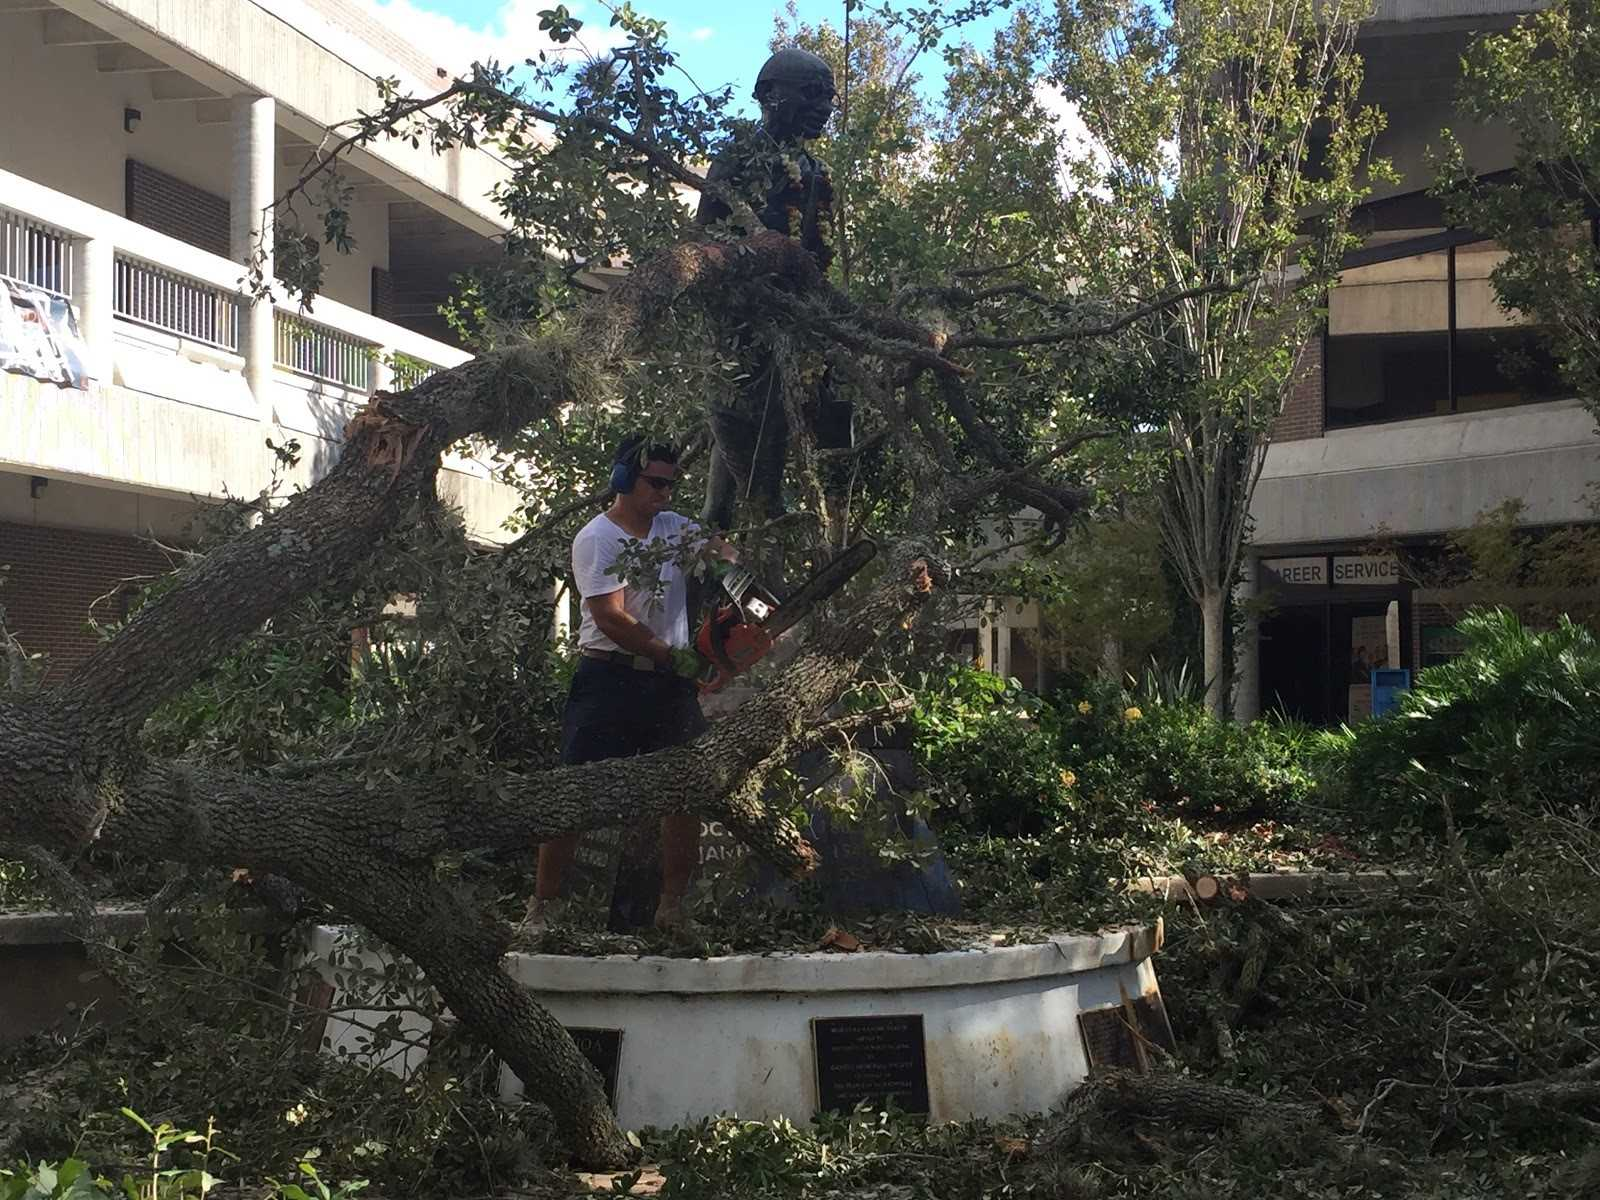 UNF alumni Juan Carlos Villatoro came to campus to help clear debris from the Ghandi statue after Hurricane Matthew. <i>Photo by Pierce Turner</i>